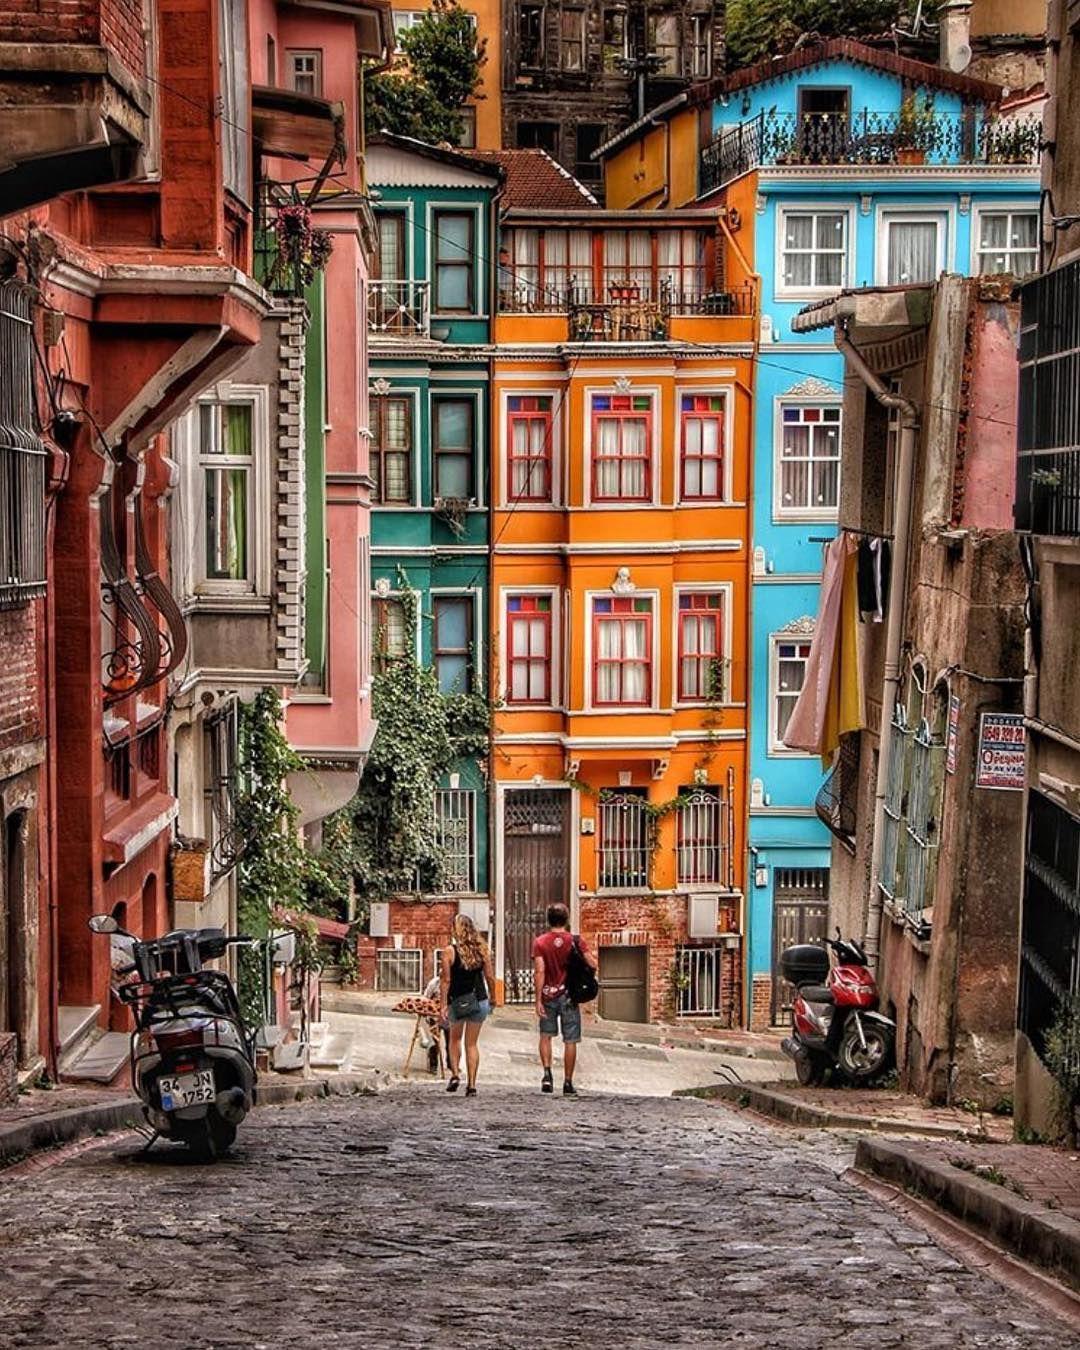 Colors of Balat ~ Istanbul, Turkey Phot | Seyahat rehberi, Seyahat fotoğrafçılığı, Seyahat tutkusu